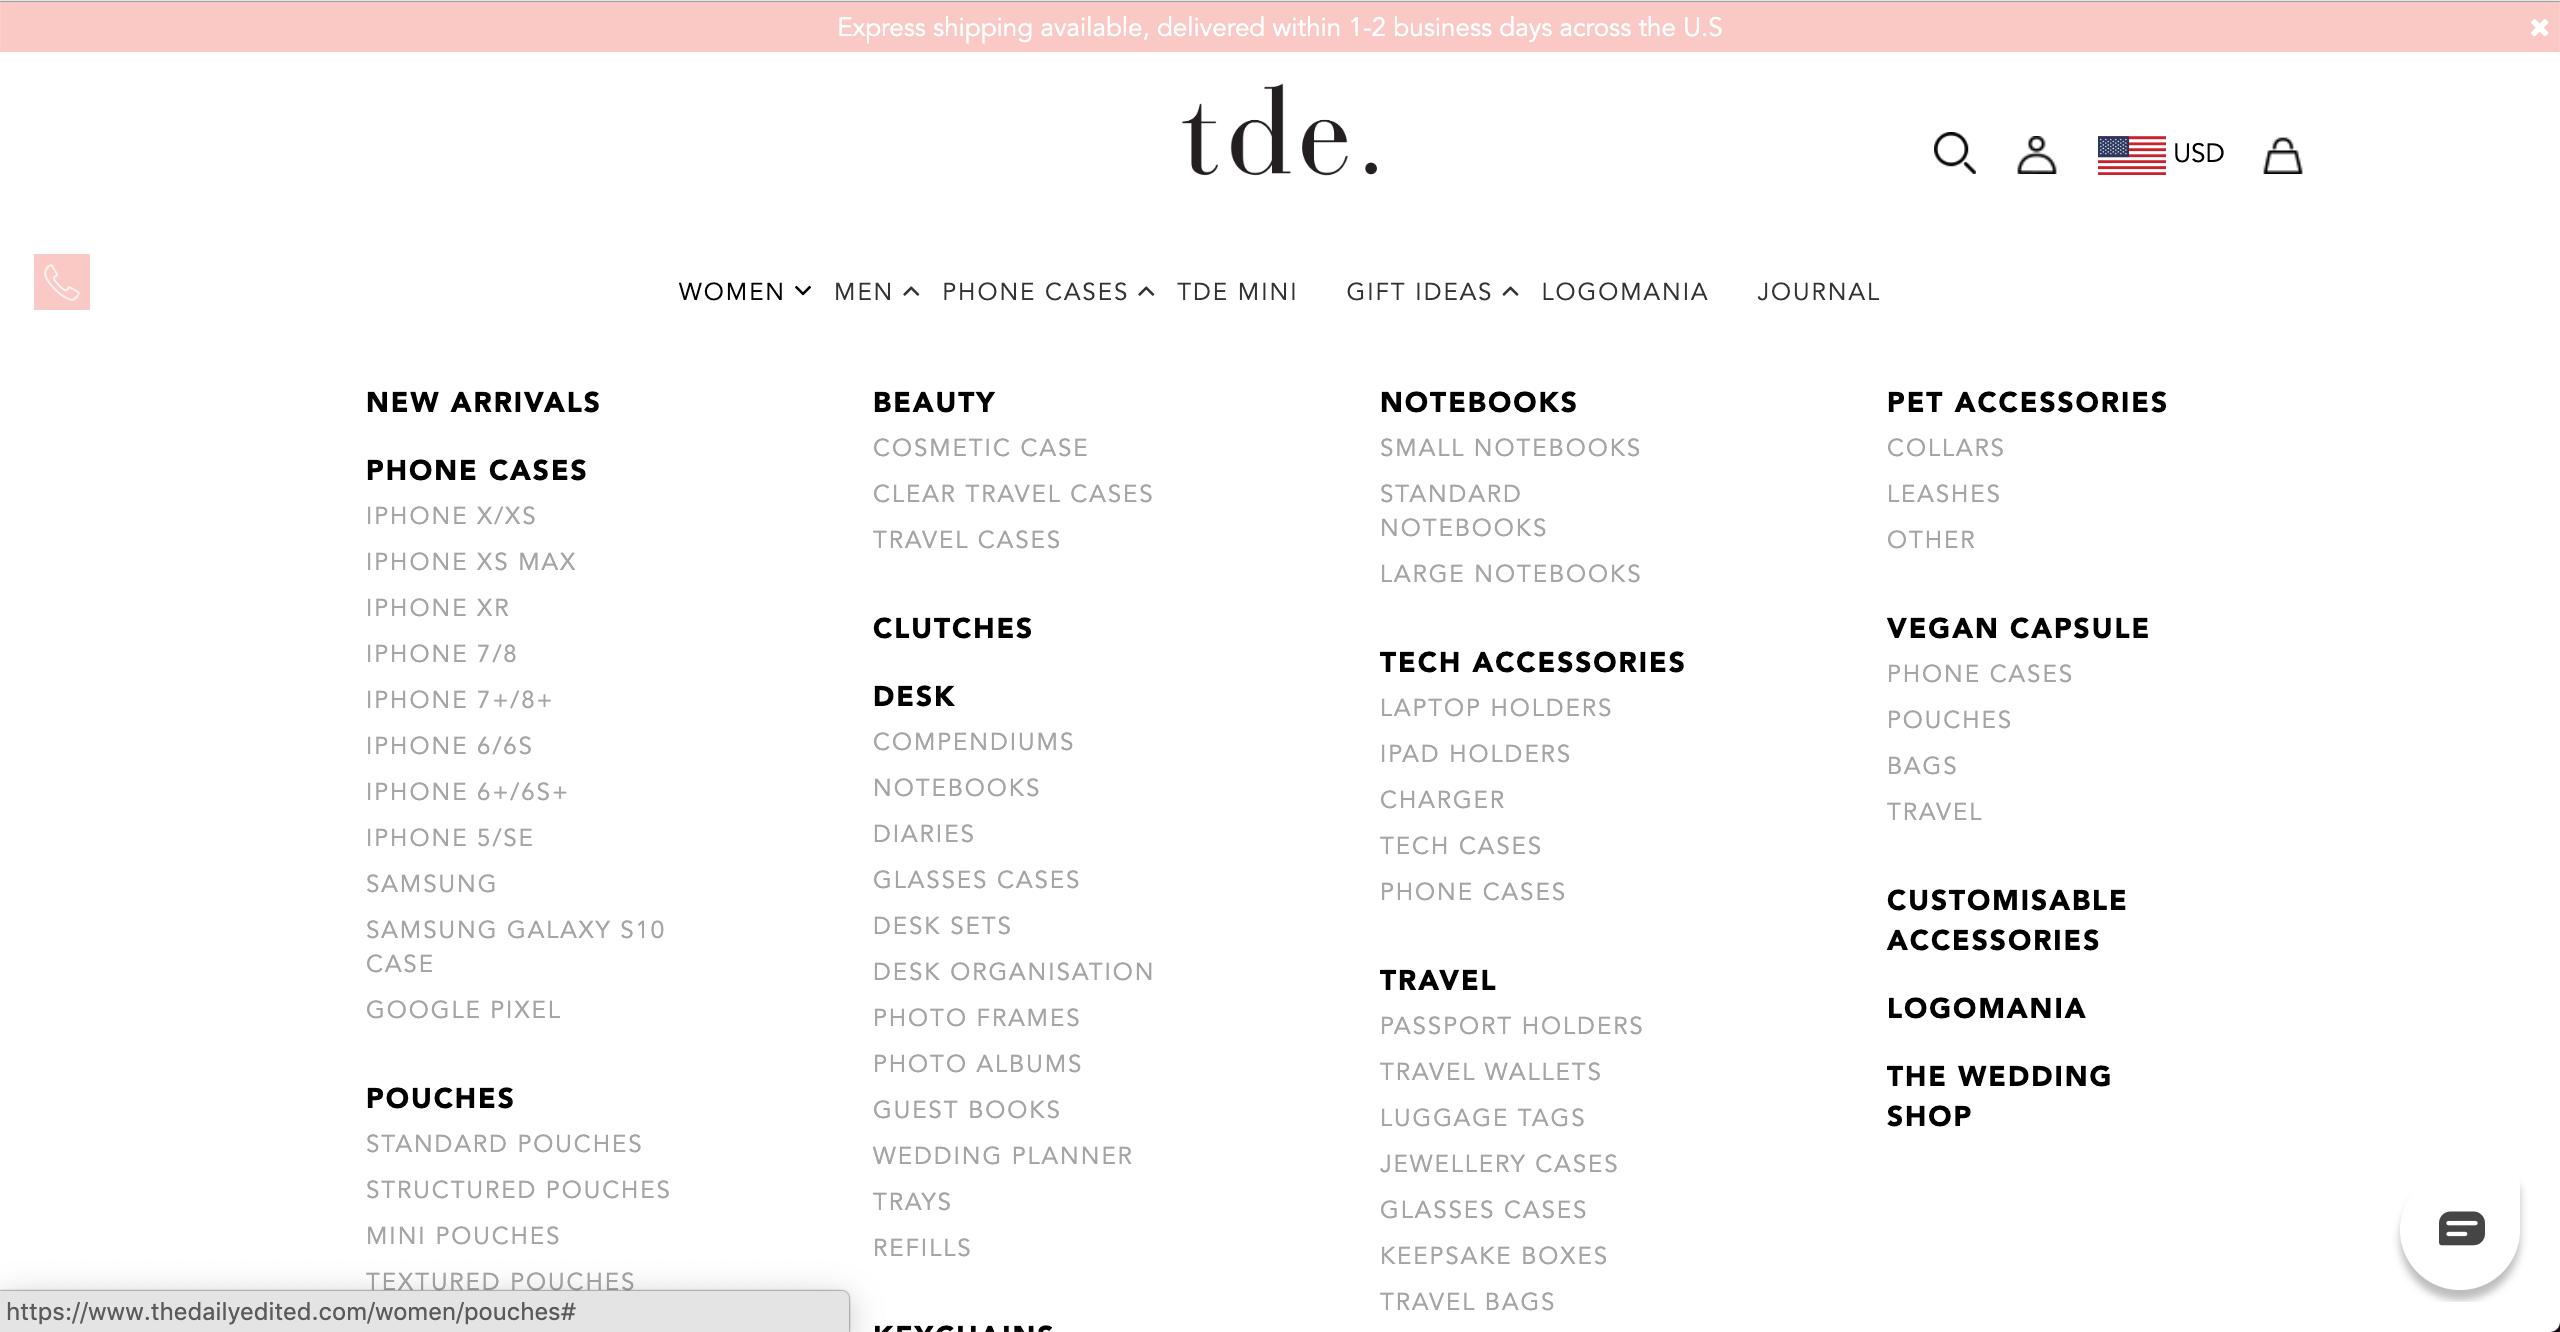 TDE women's products